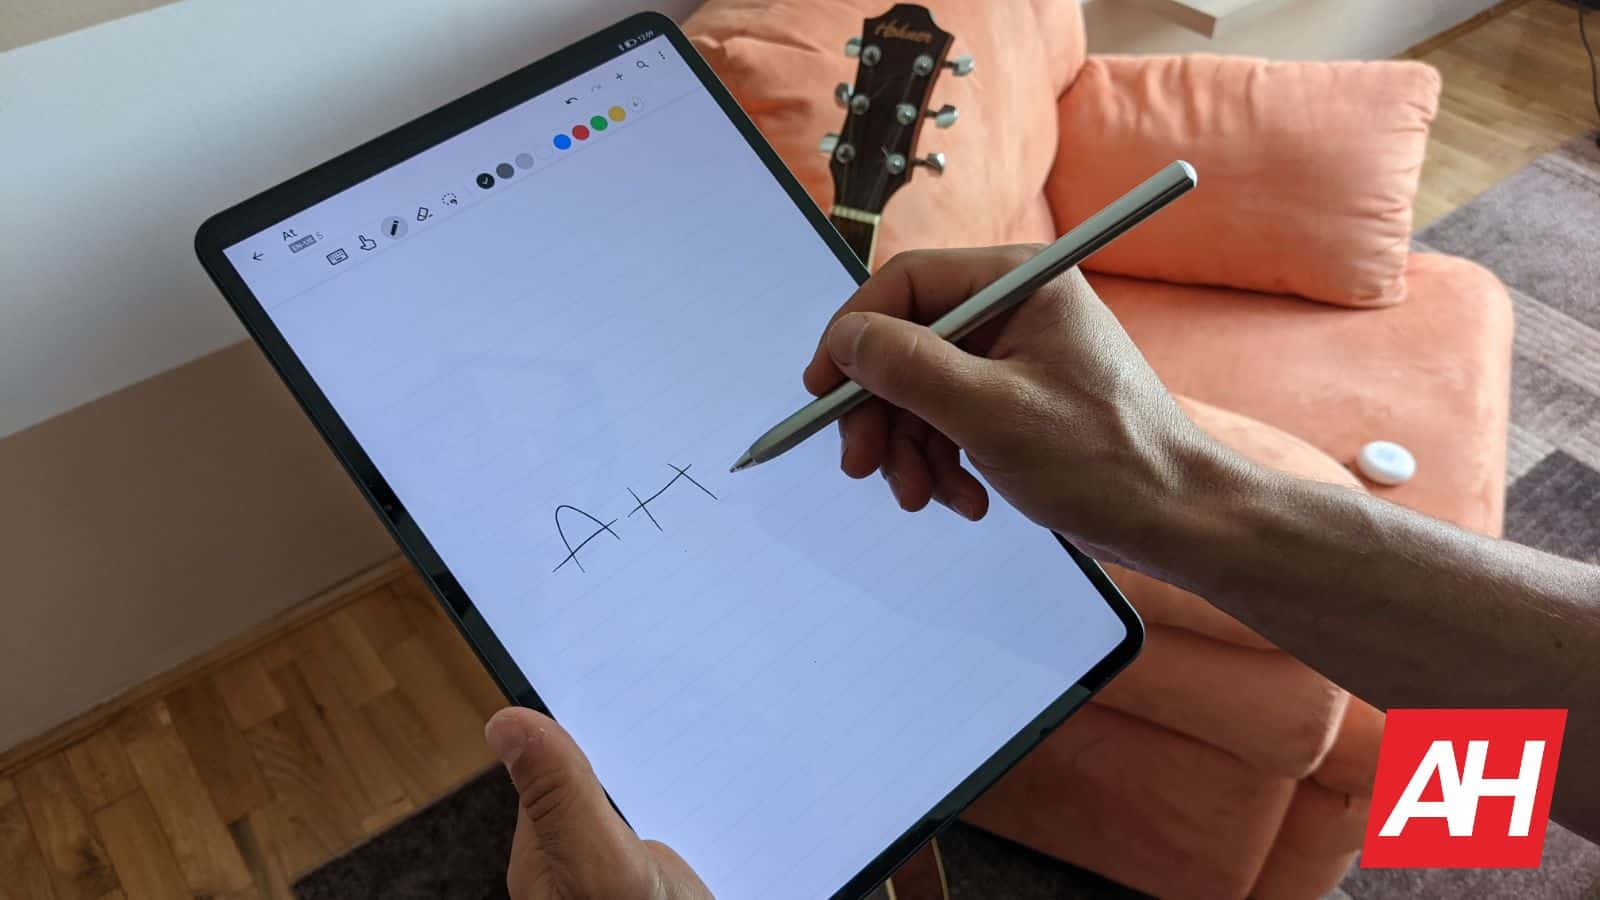 AH Huawei Pencil 2021 image 5